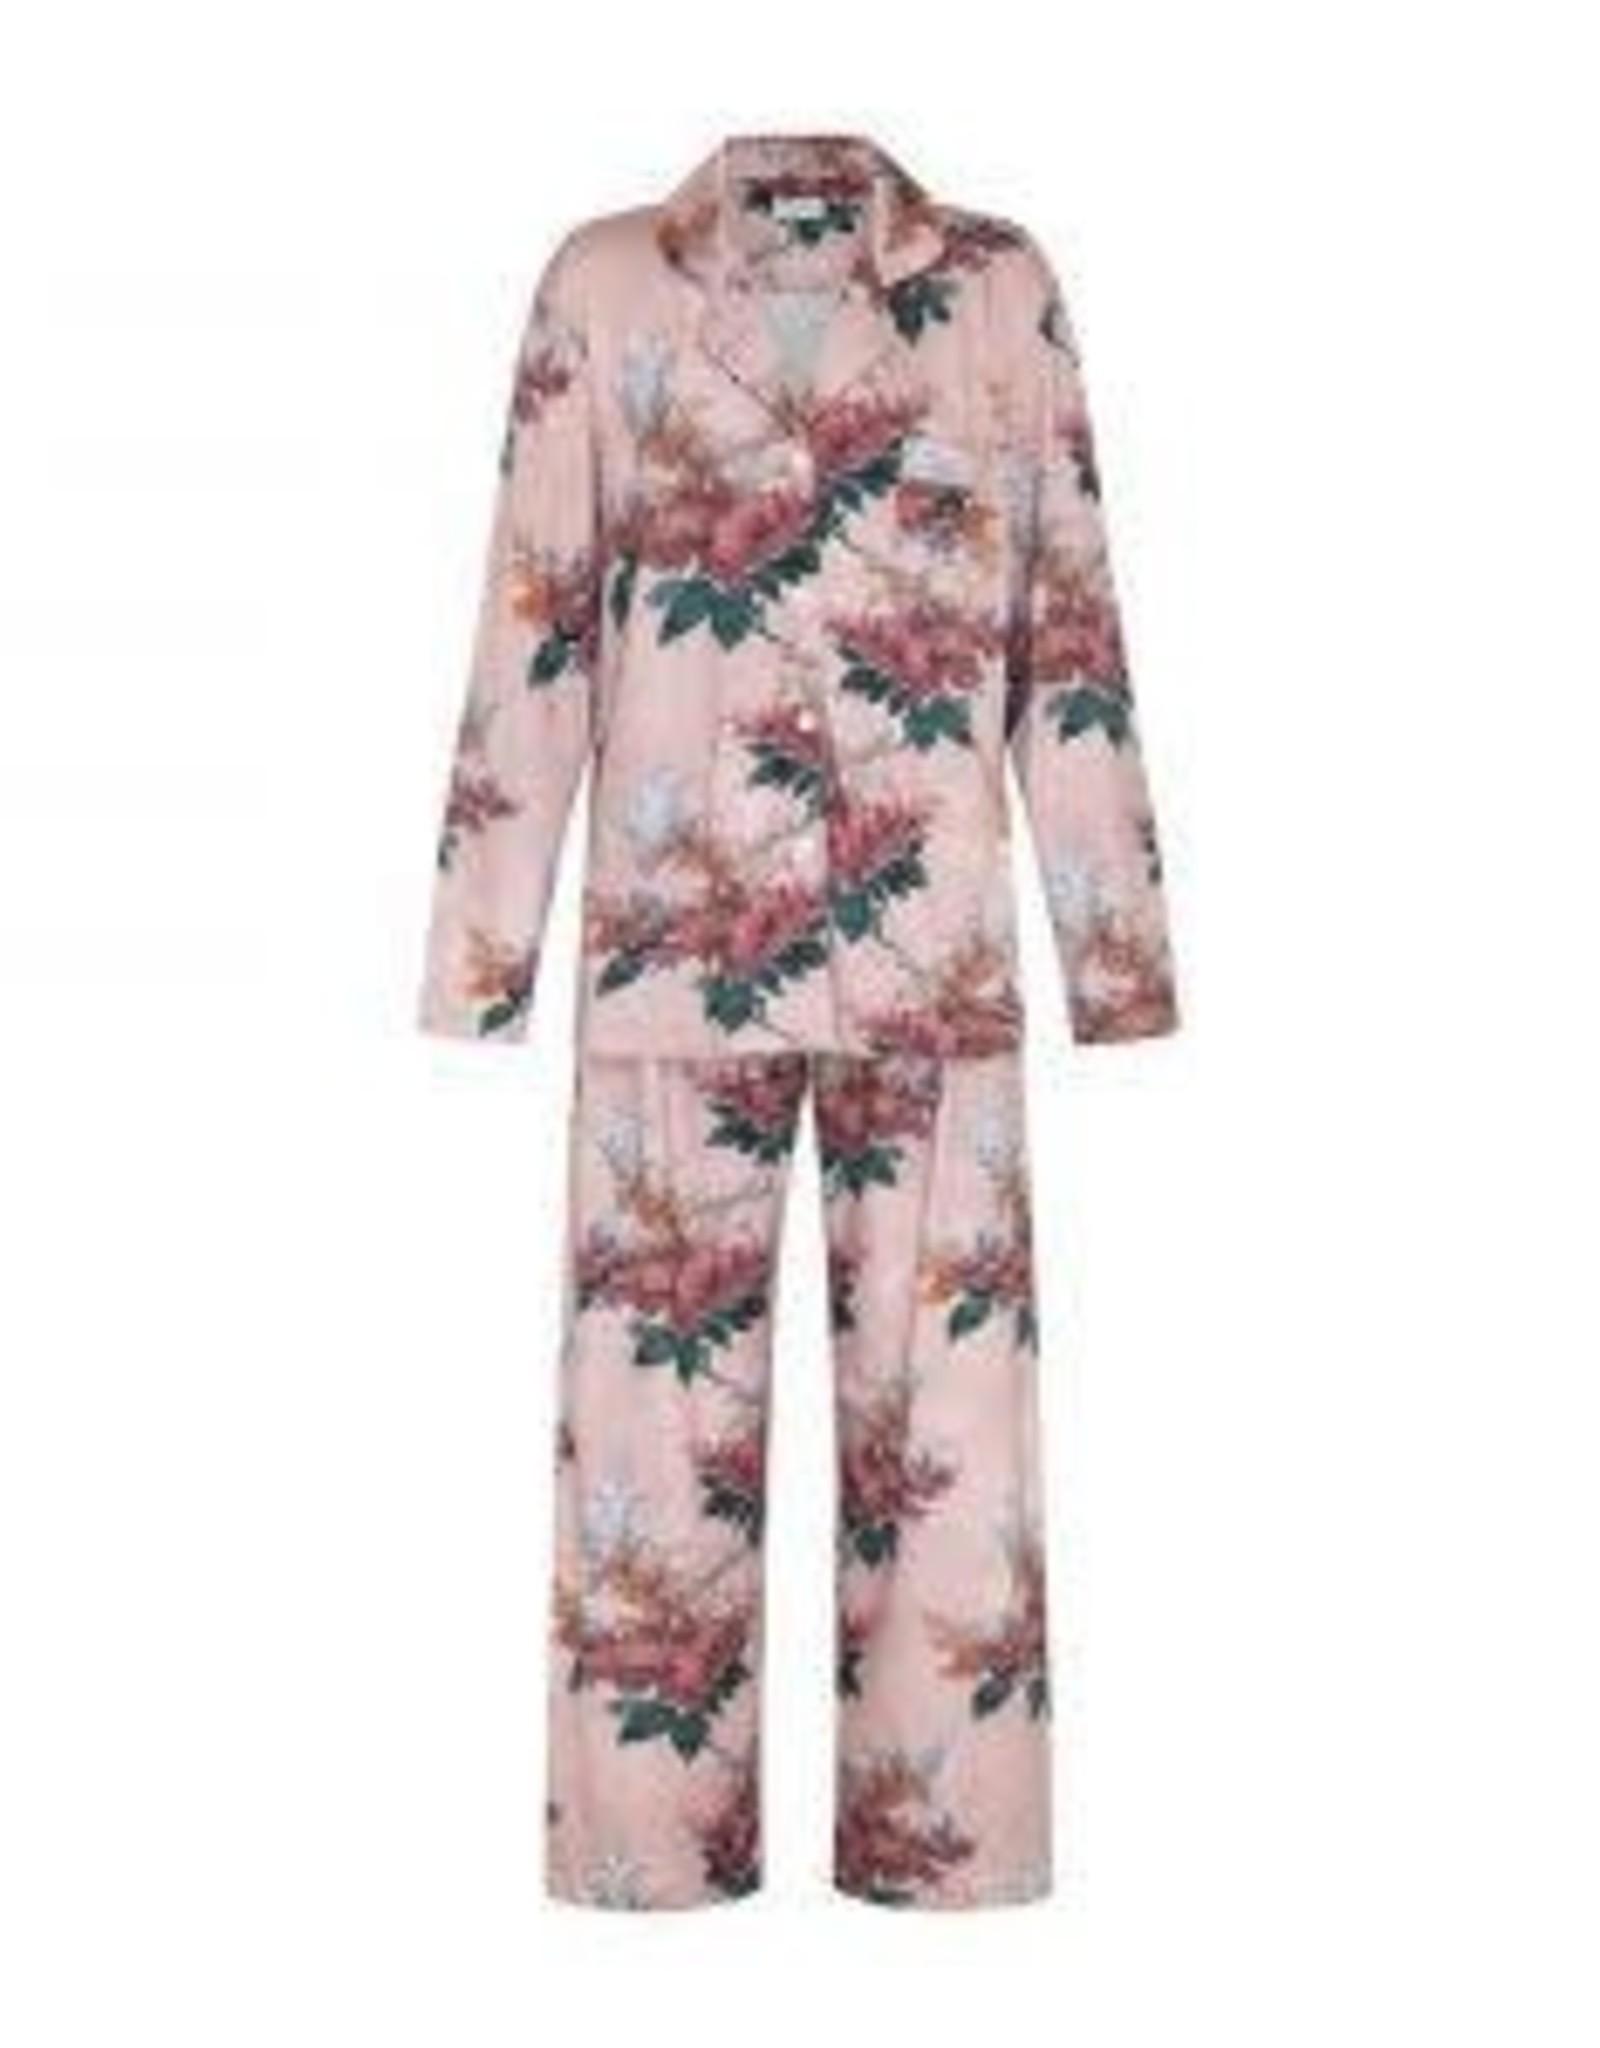 Pyjamas Pink Stock Floral - MEDIUM